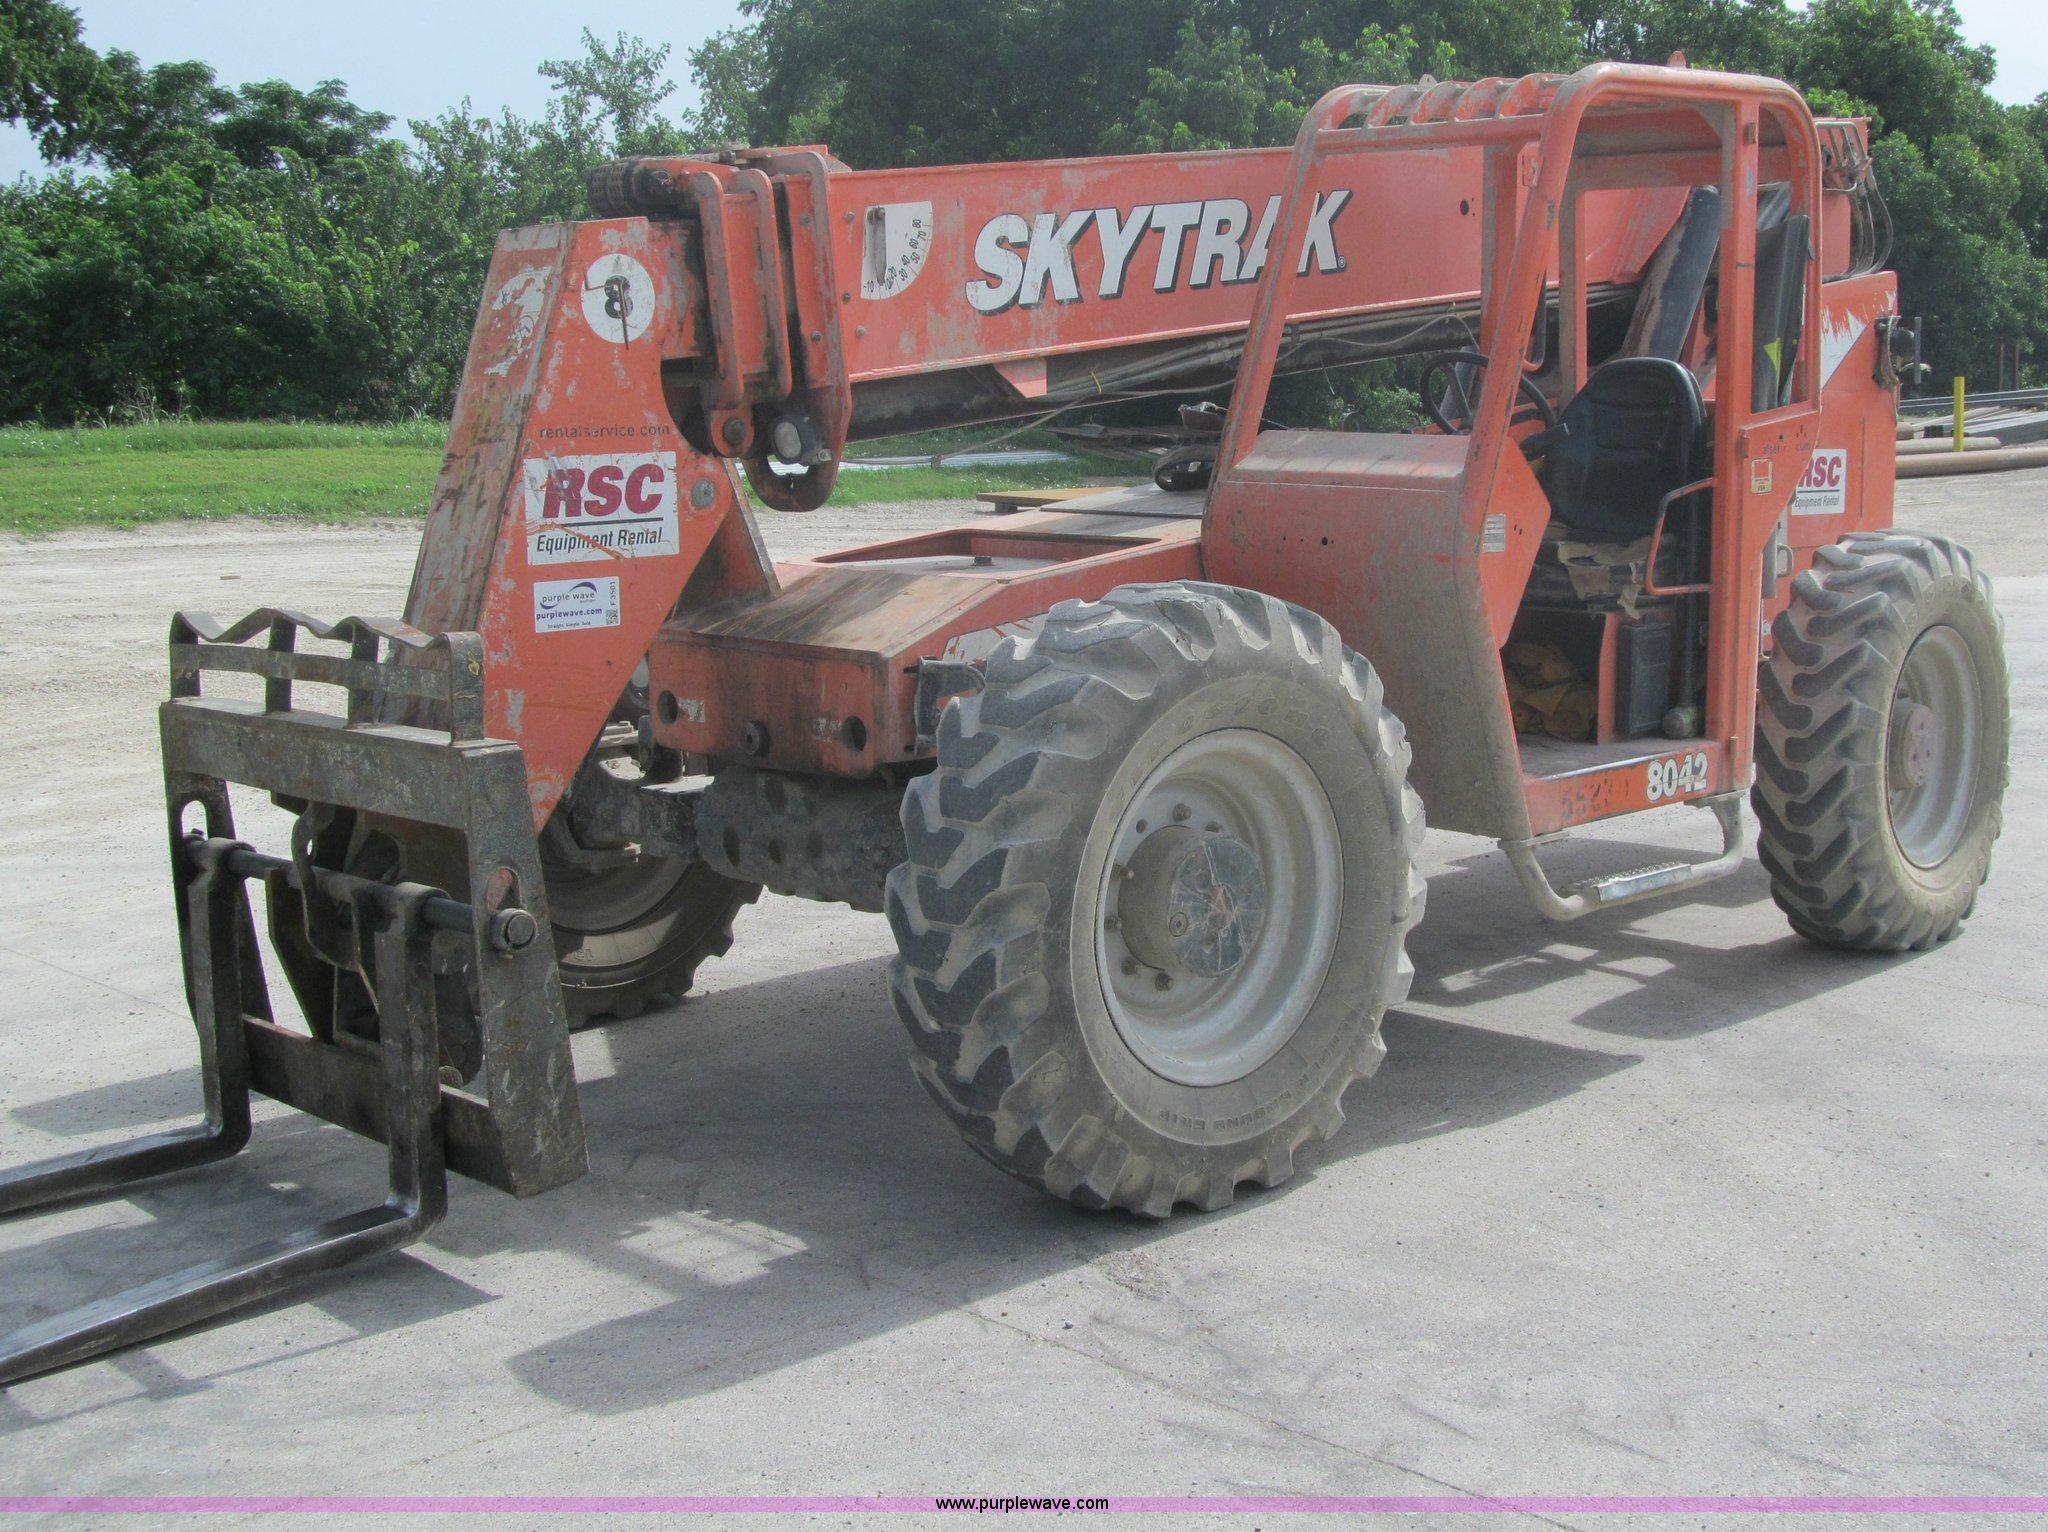 ... 2005 skytrak 8042 telehandler item f3501 sold! july 31 c skytrak 8042 wiring  diagram f3501